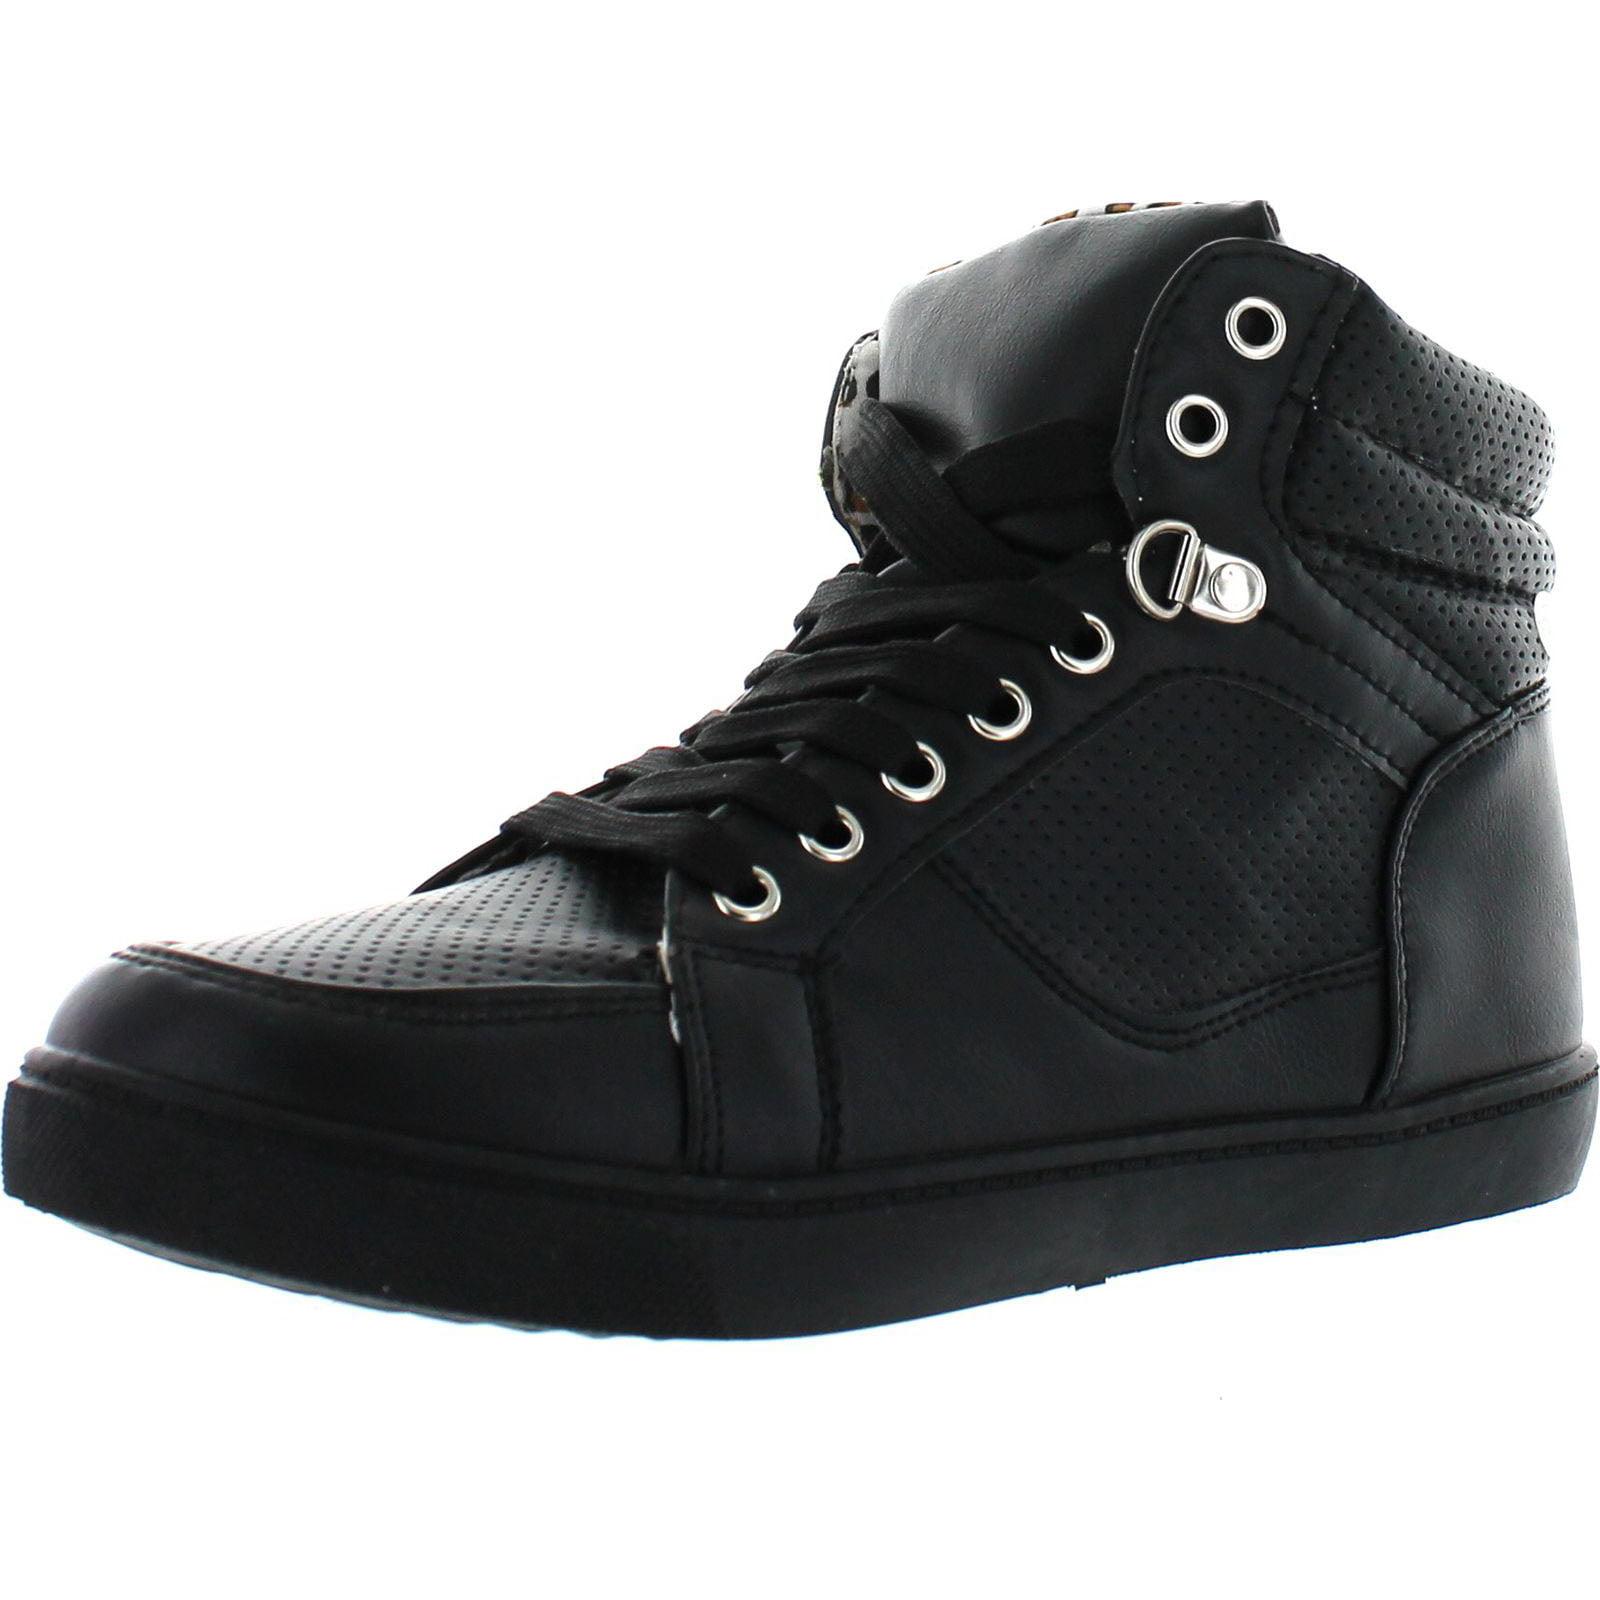 Js Awake Womens Perla-02 Ankle High Top Fashion Sneakers -7178